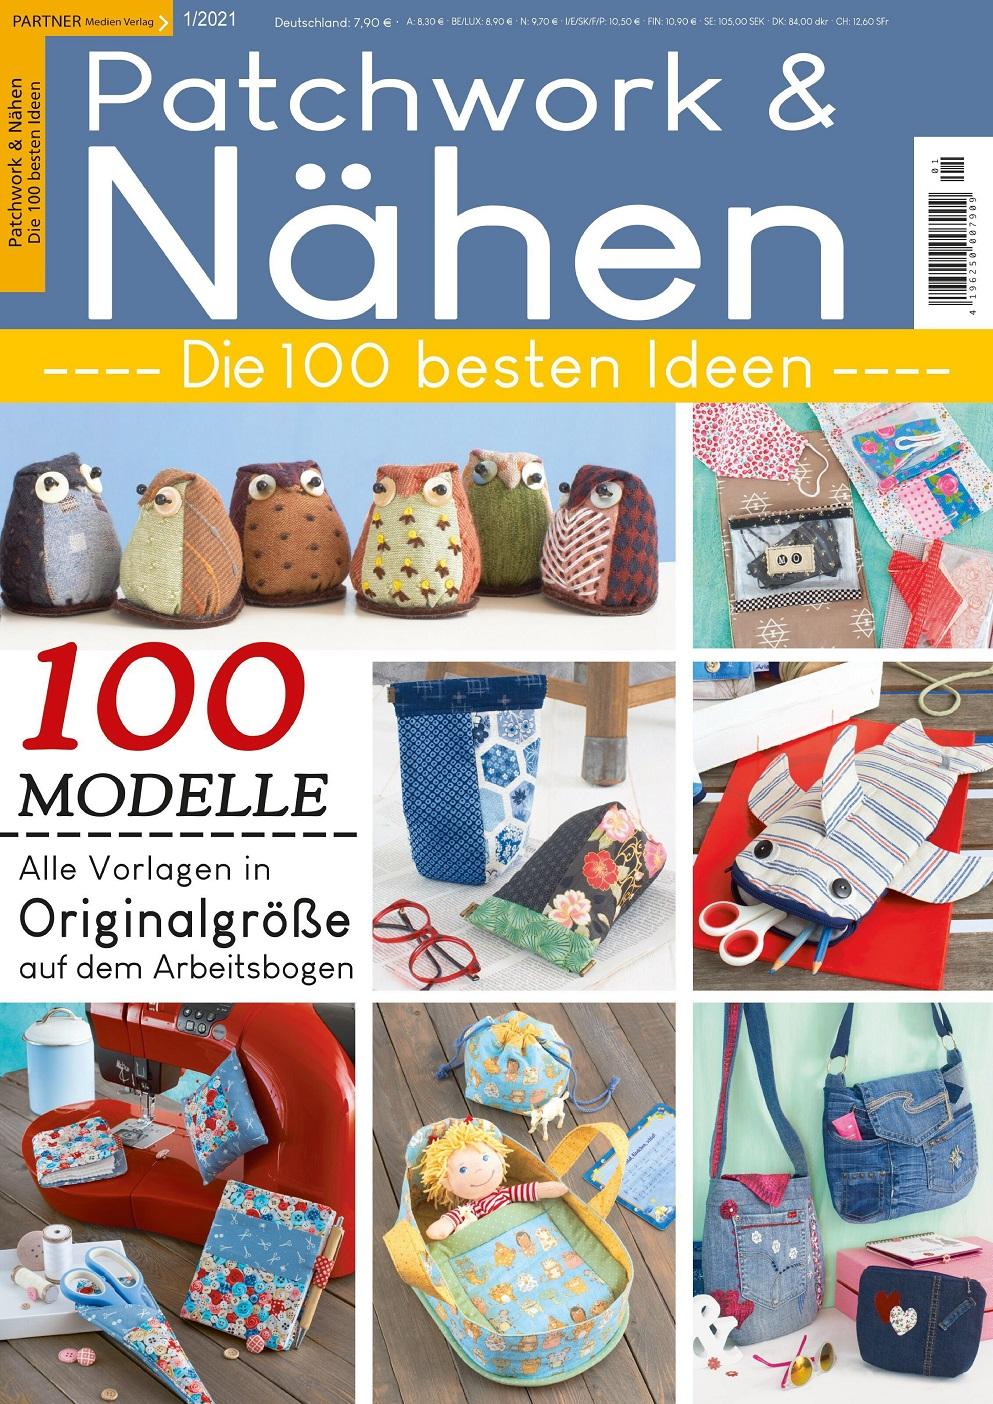 Немецкий журнал по пэчворку Patchwork & Nahen Spezial №1 2021